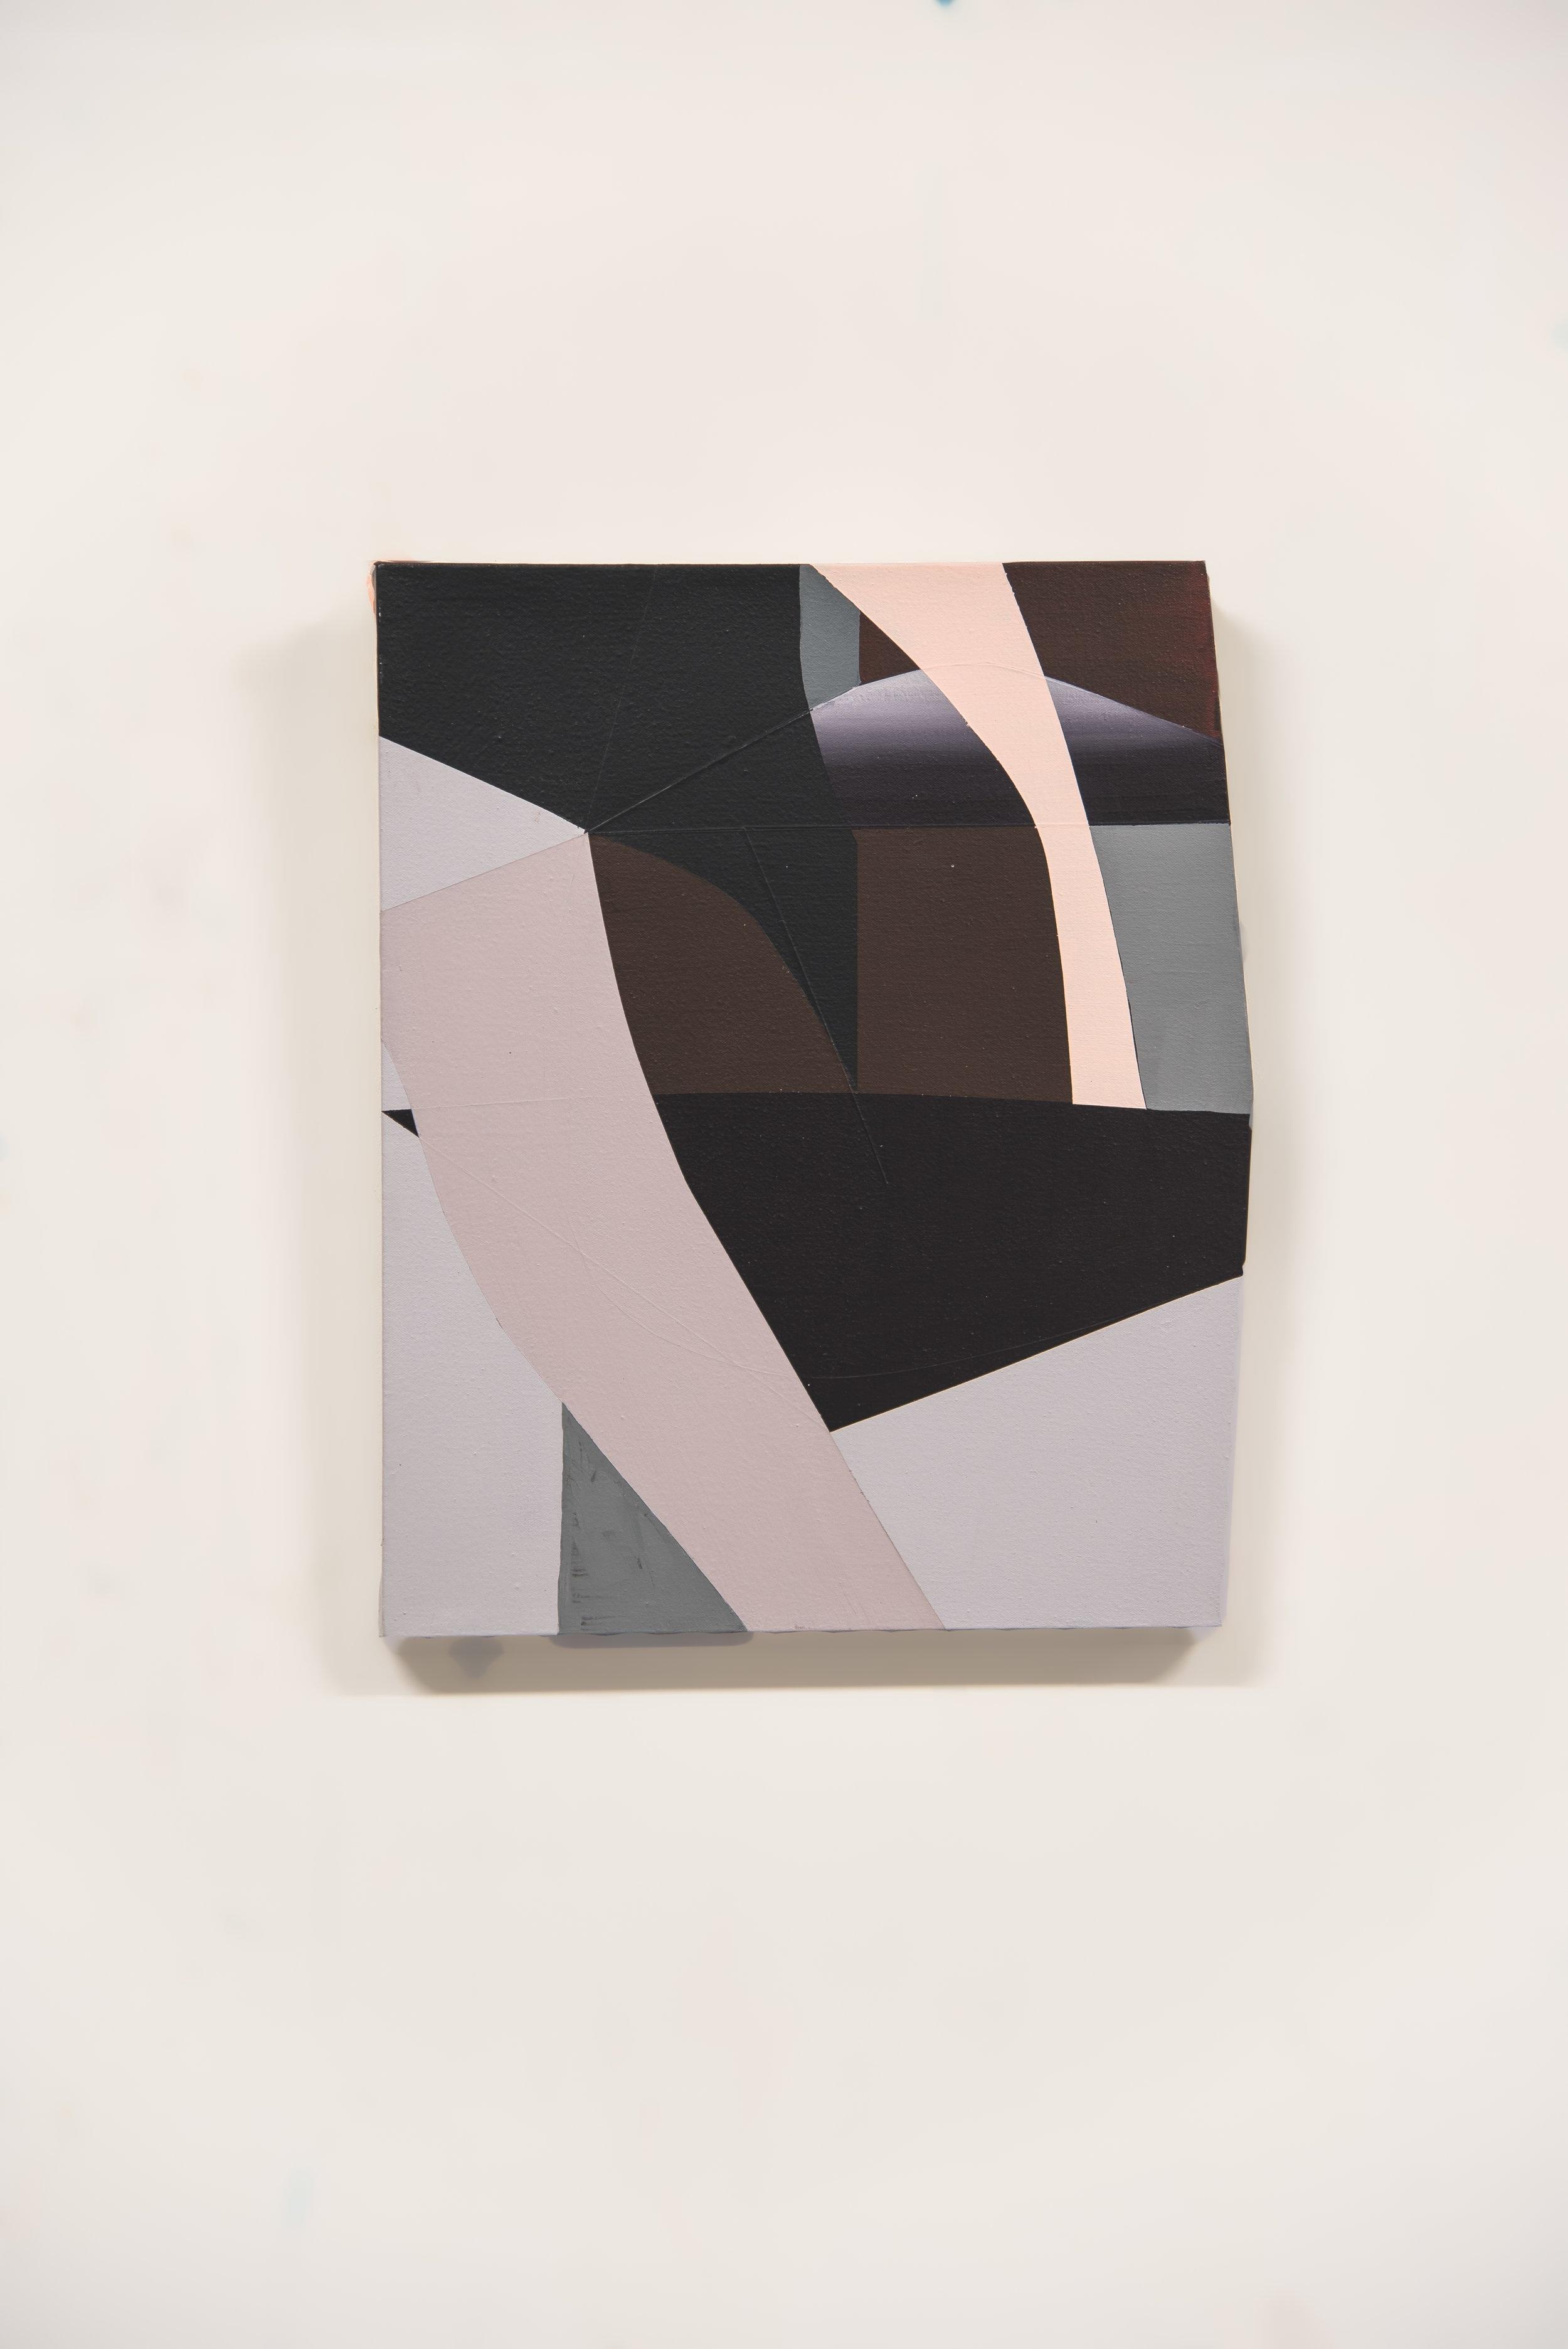 Proximity #2  Acrylic on canvas  18 x 22 in   2019